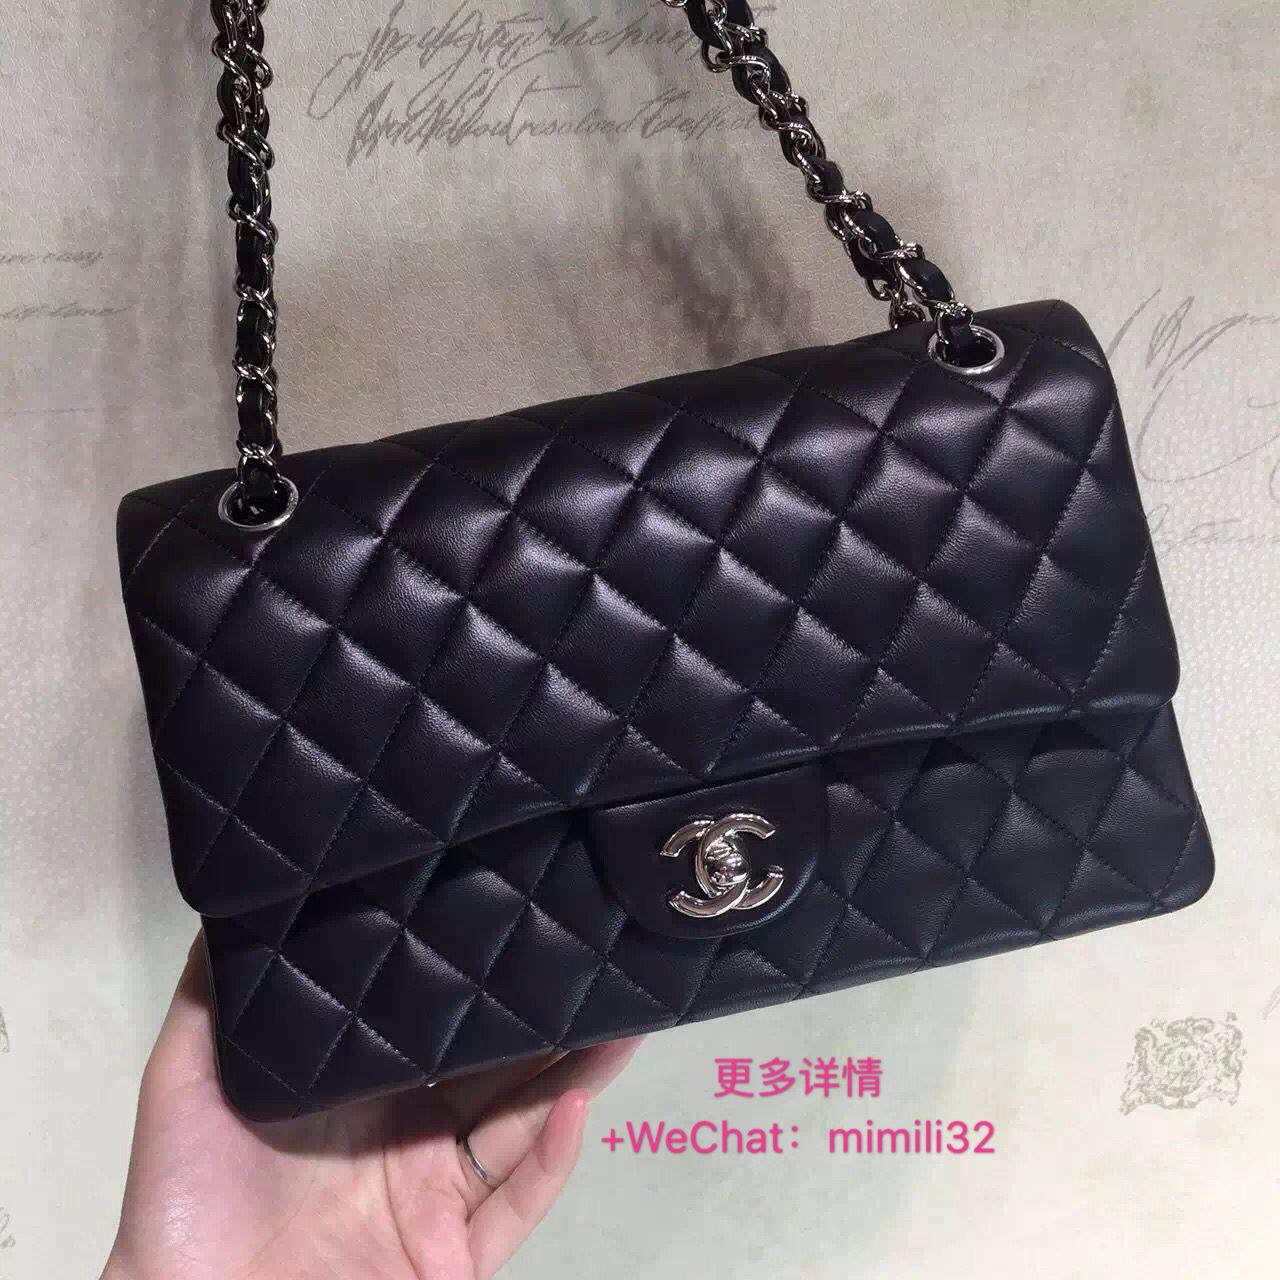 bce3548ff74a38 Chanel cf 25.5Cm, buy it+wechat:mimili32 | Chanel classic flap ...